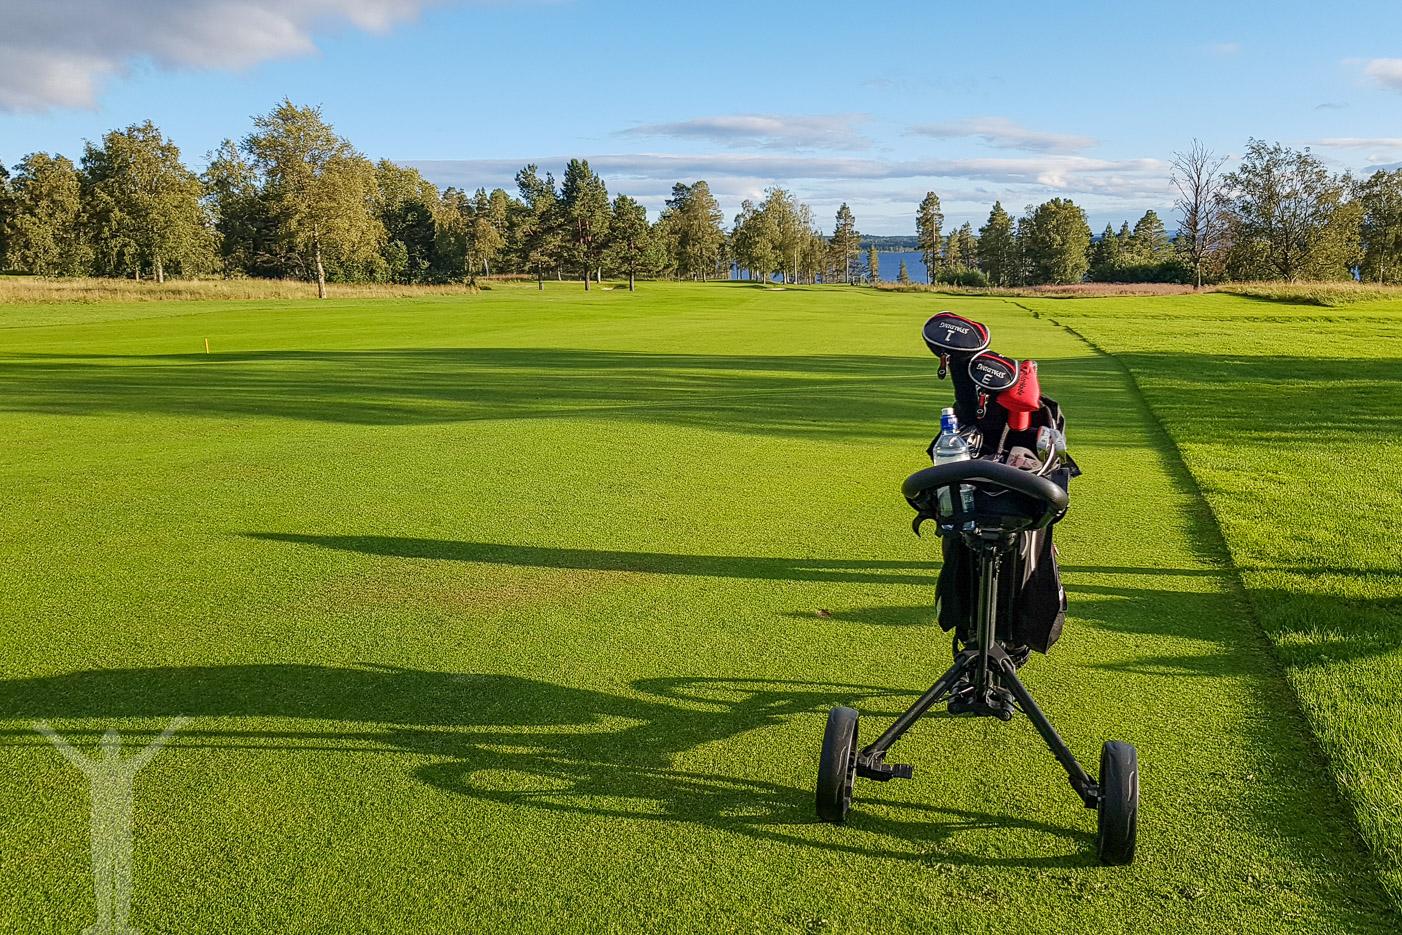 Hål 3 på Östersund Frösö Golfklubb